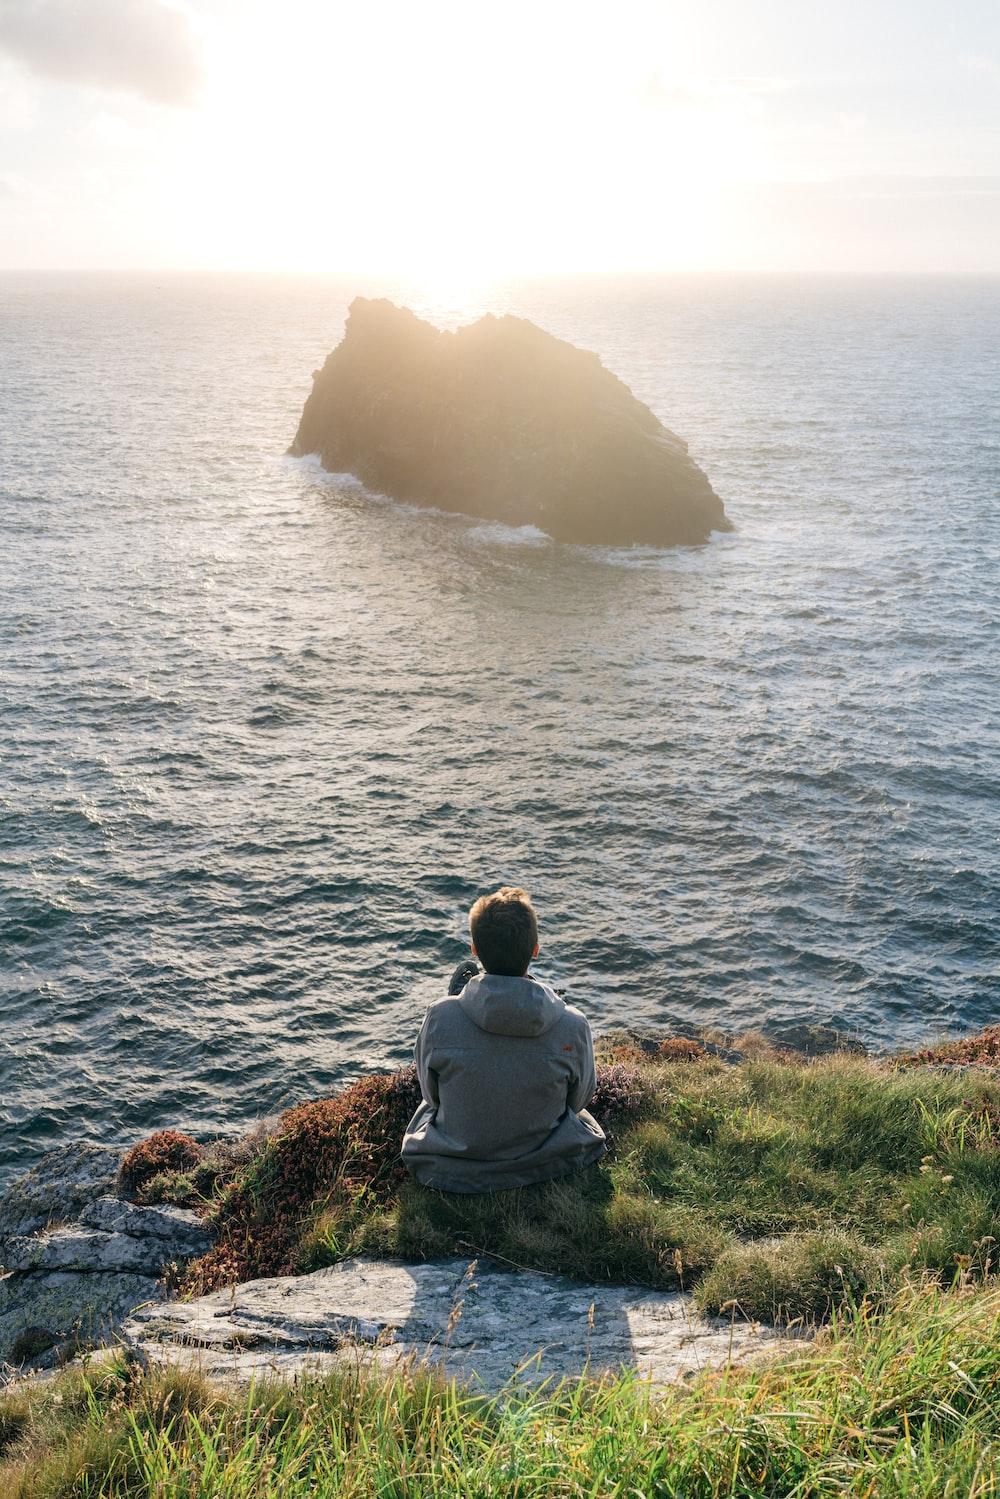 man sitting on grass beside ocean during daytime